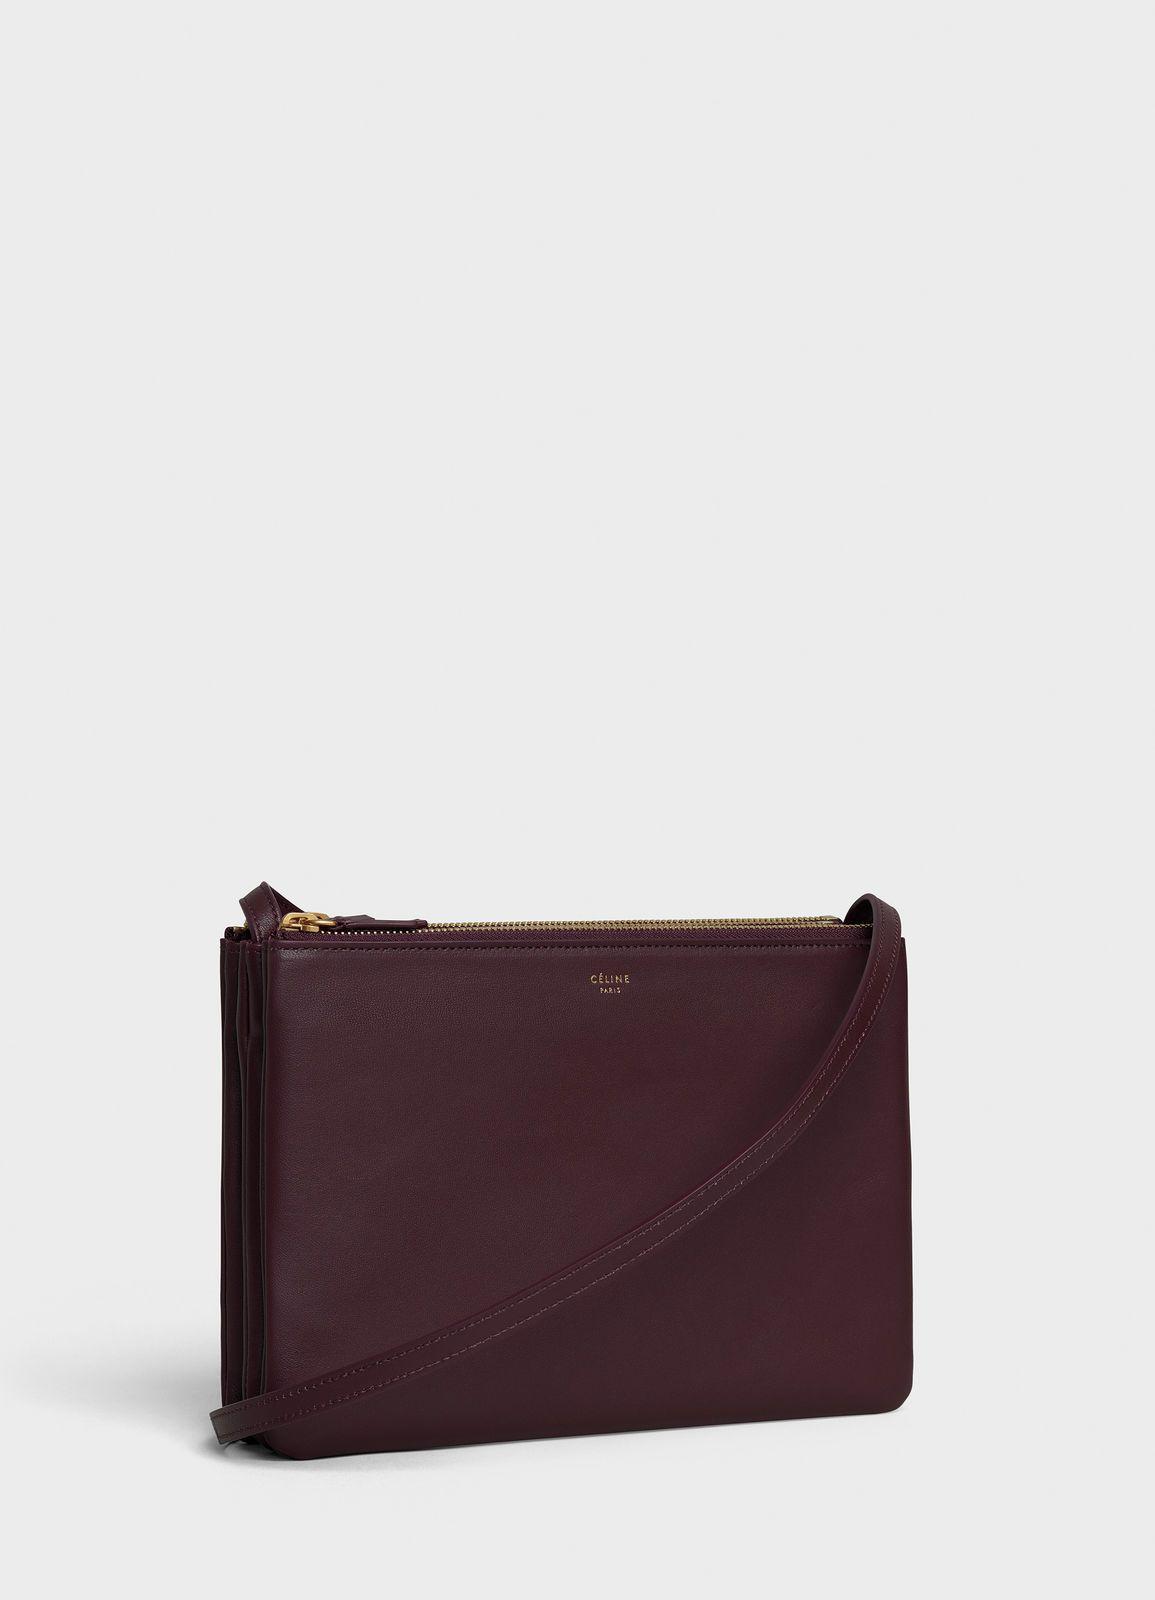 088f075601f9 Large Trio bag in smooth lambskin